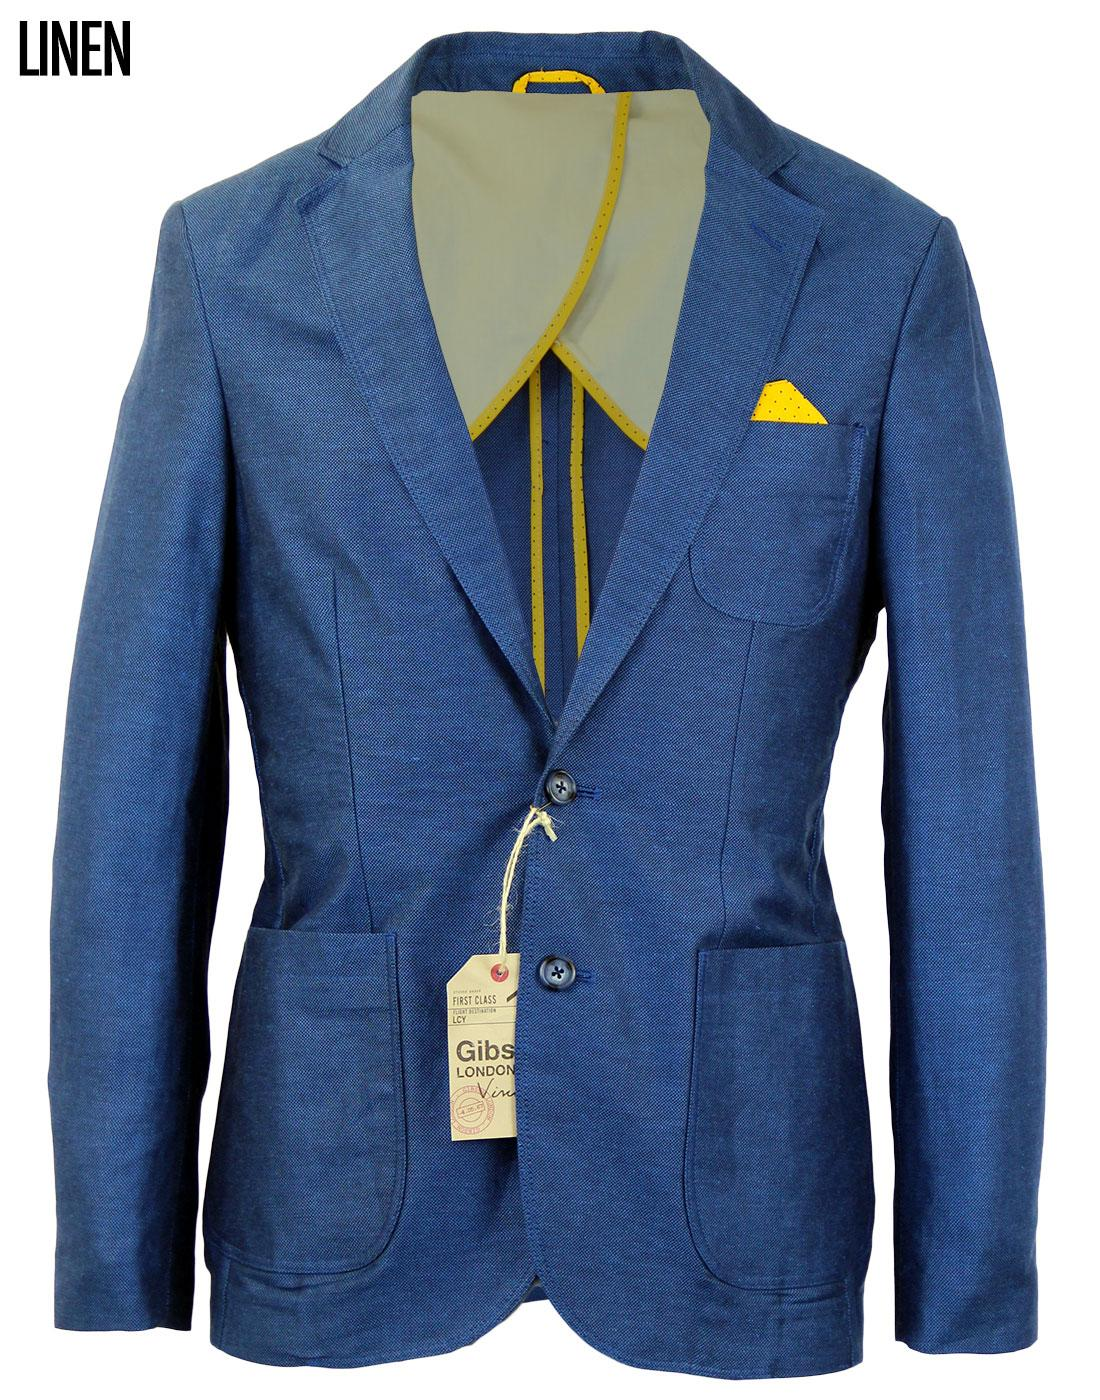 Ludgate GIBSON LONDON Retro Tailored Linen Blazer